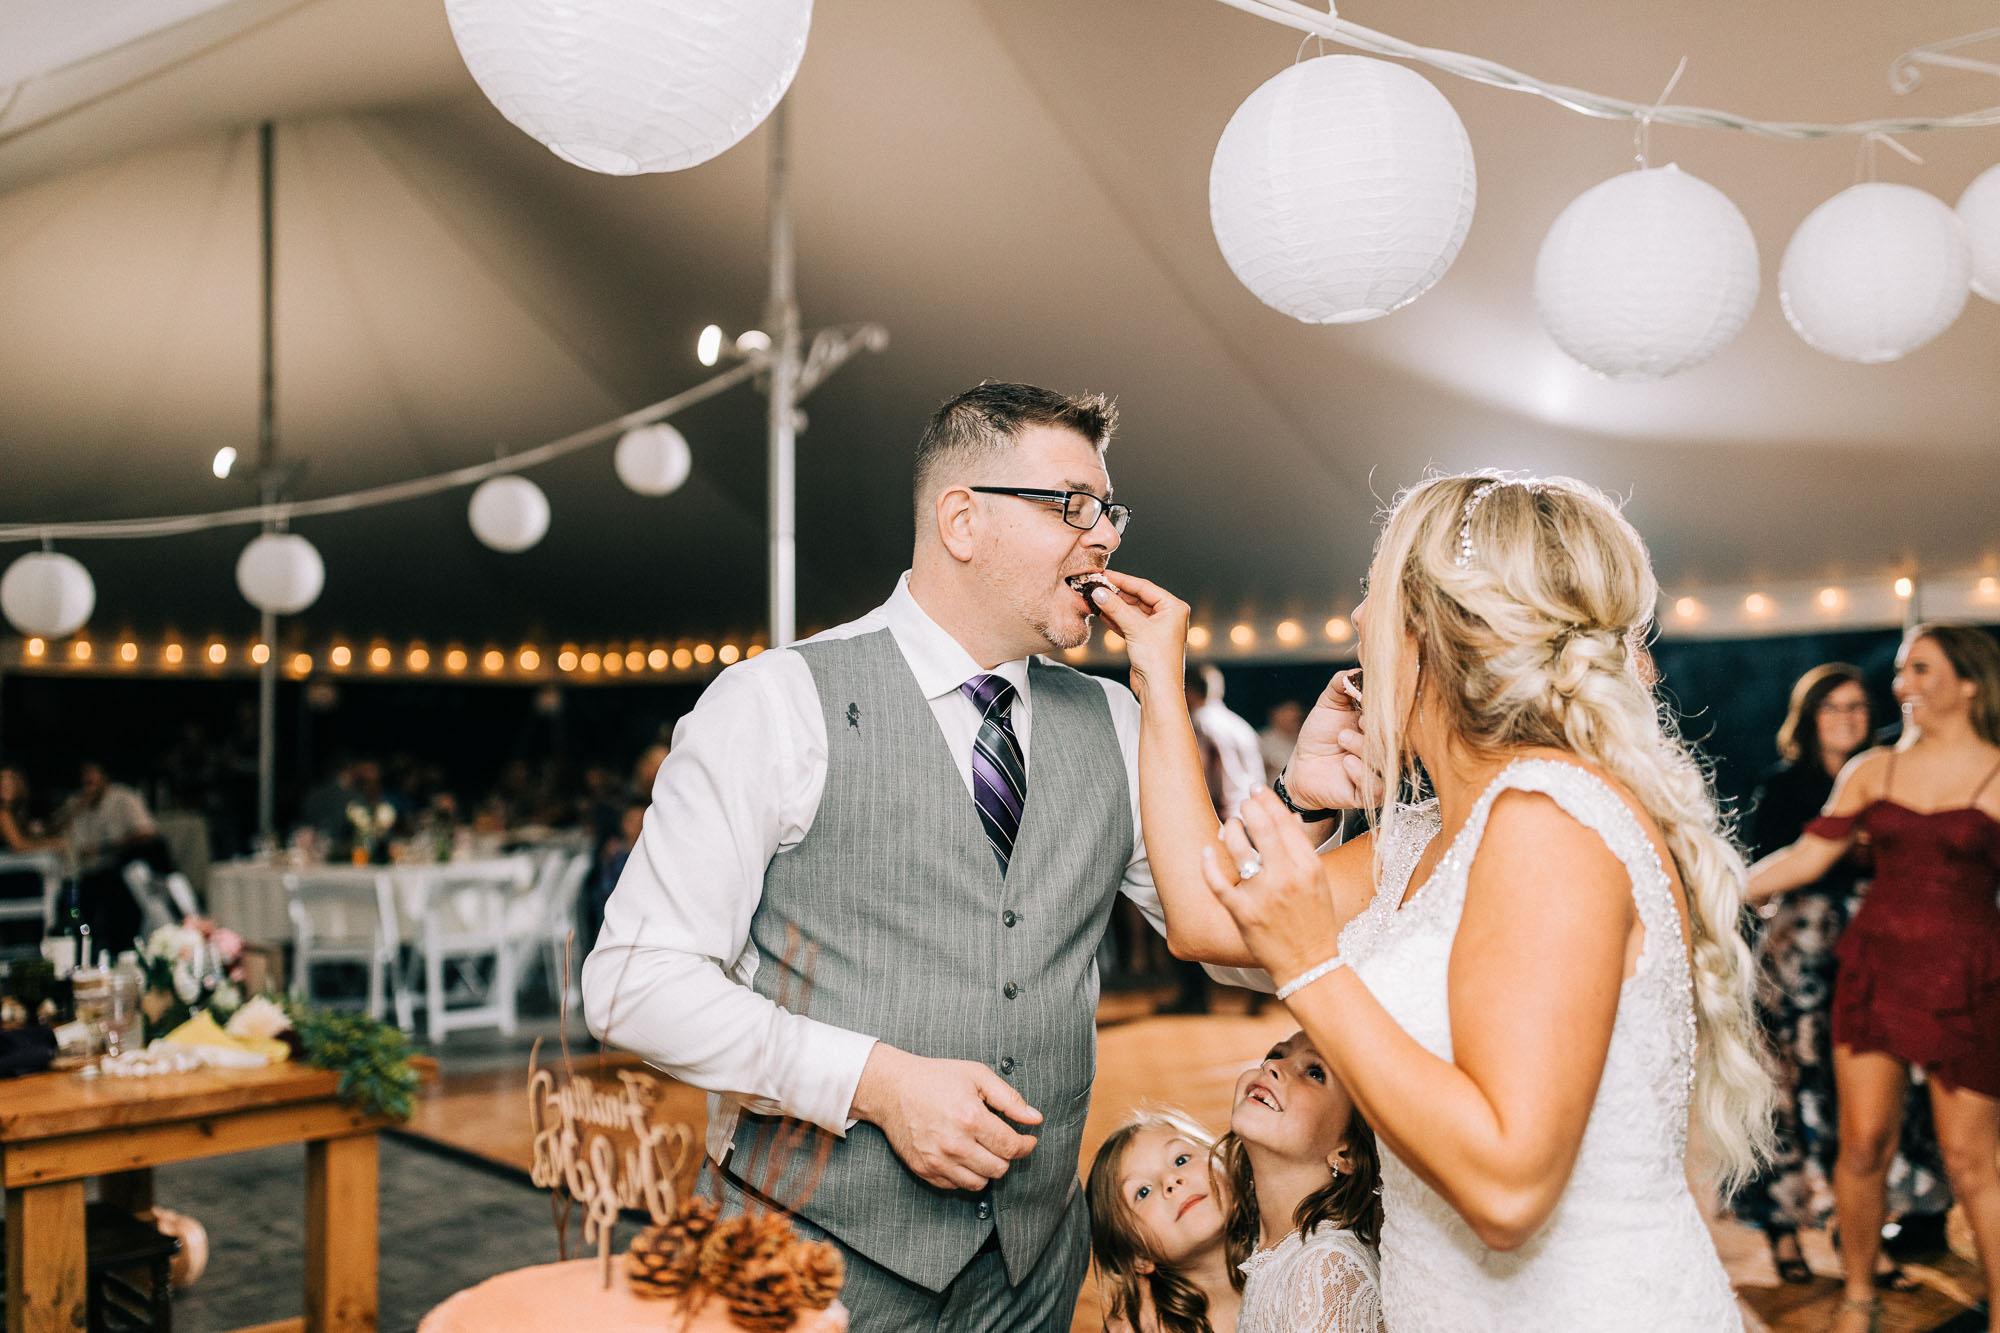 Lodge-at-Raven-Creek-October-wedding-77.jpg